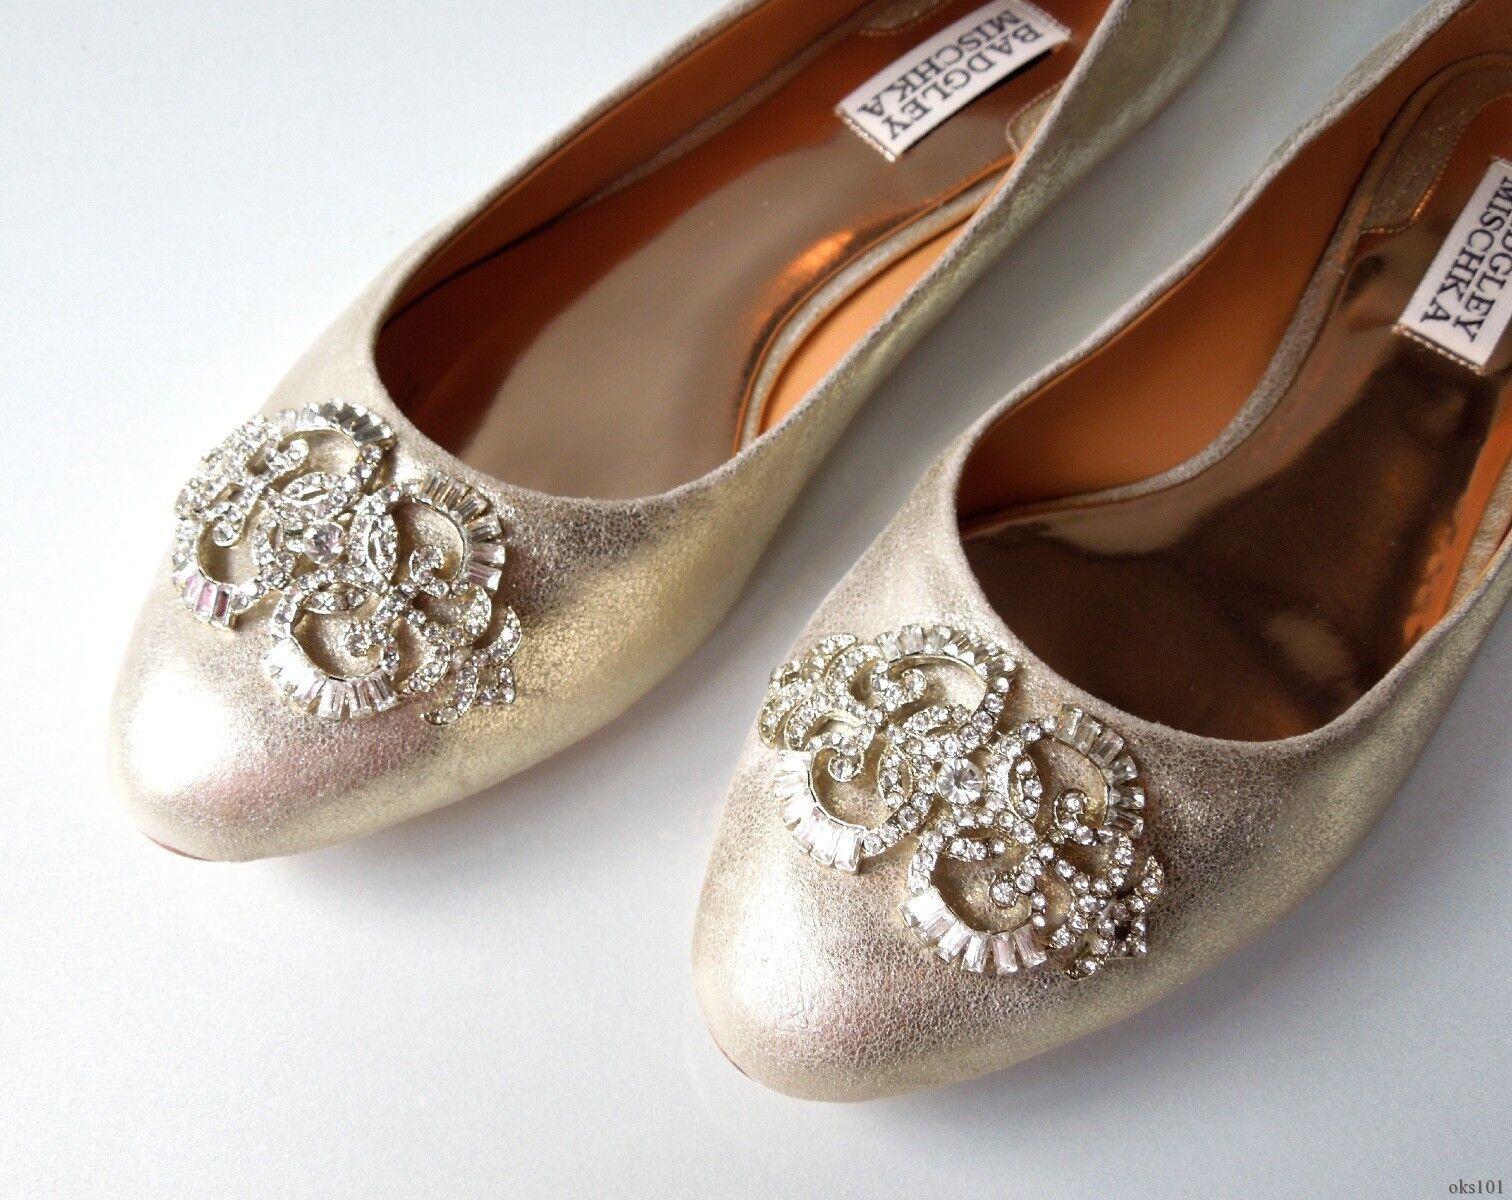 New BADGLEY MISCHKA MISCHKA MISCHKA beige nude gold JEWELED flats shoes 7.5 - WEDDING 979c99